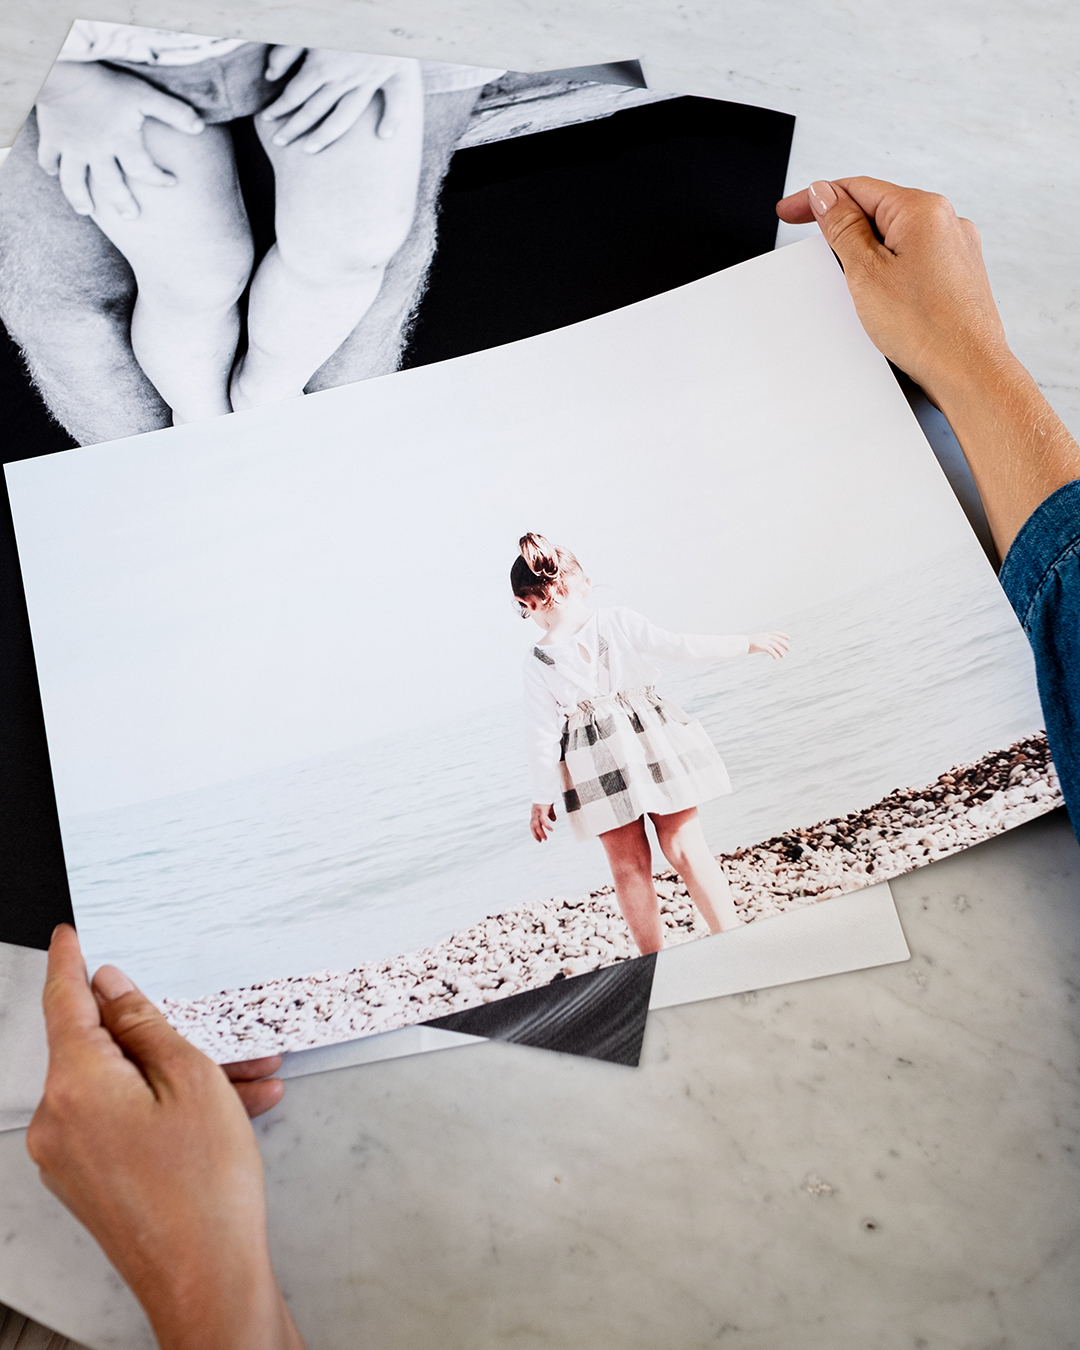 framkalla-bilder-fine-art-posters